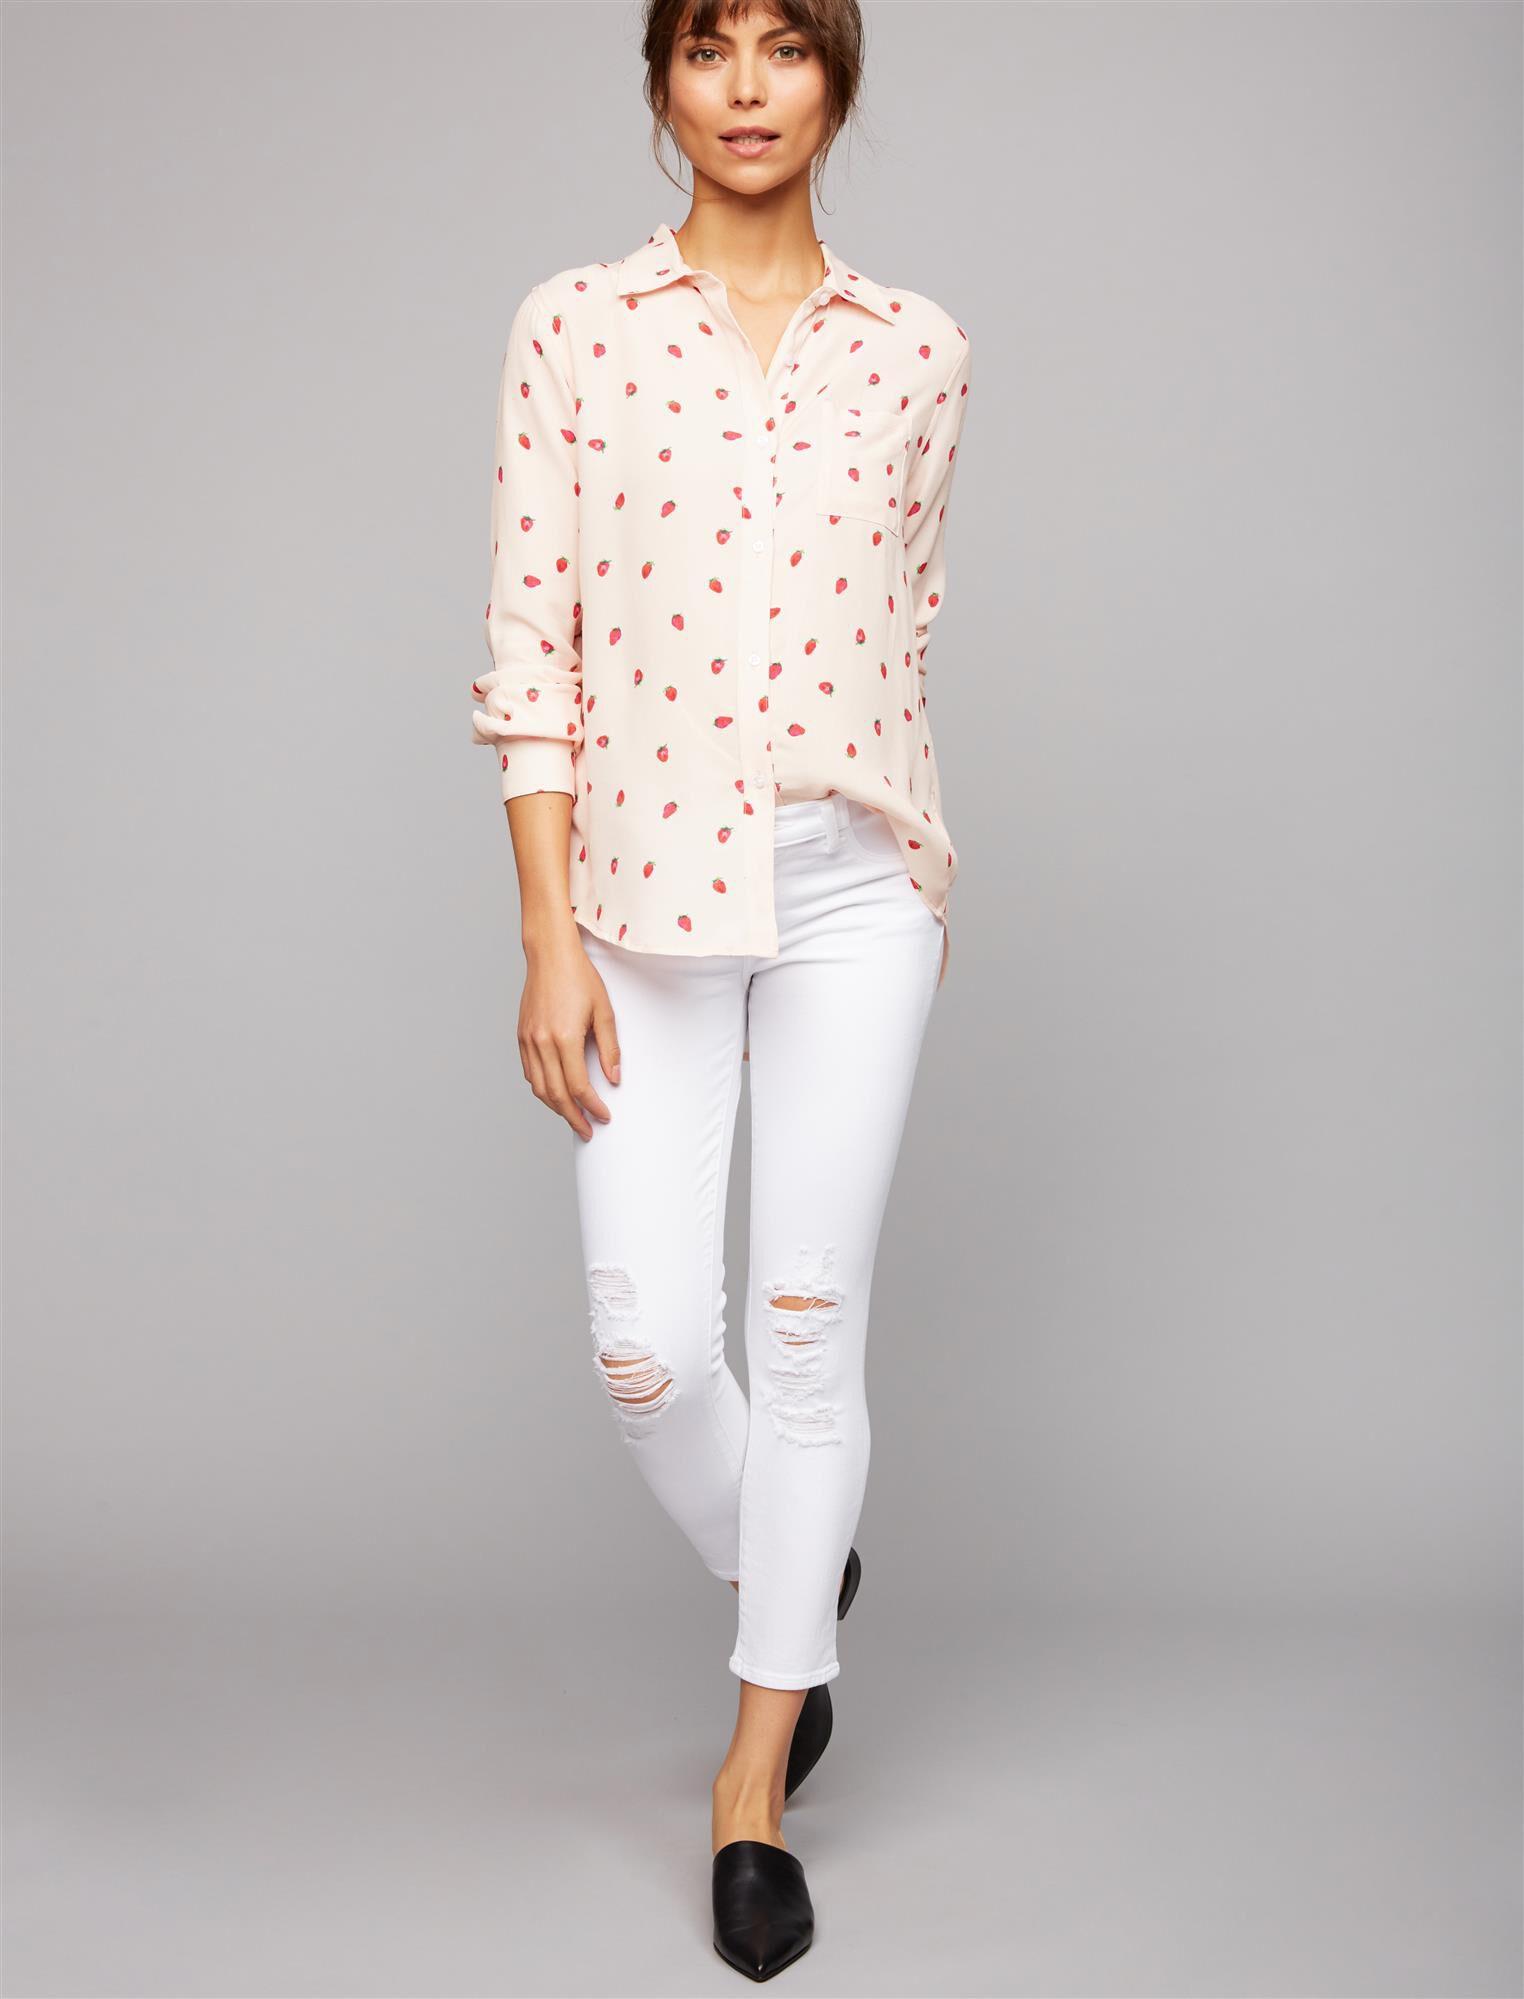 J Brand Under Belly Skinny Maternity Jeans- White